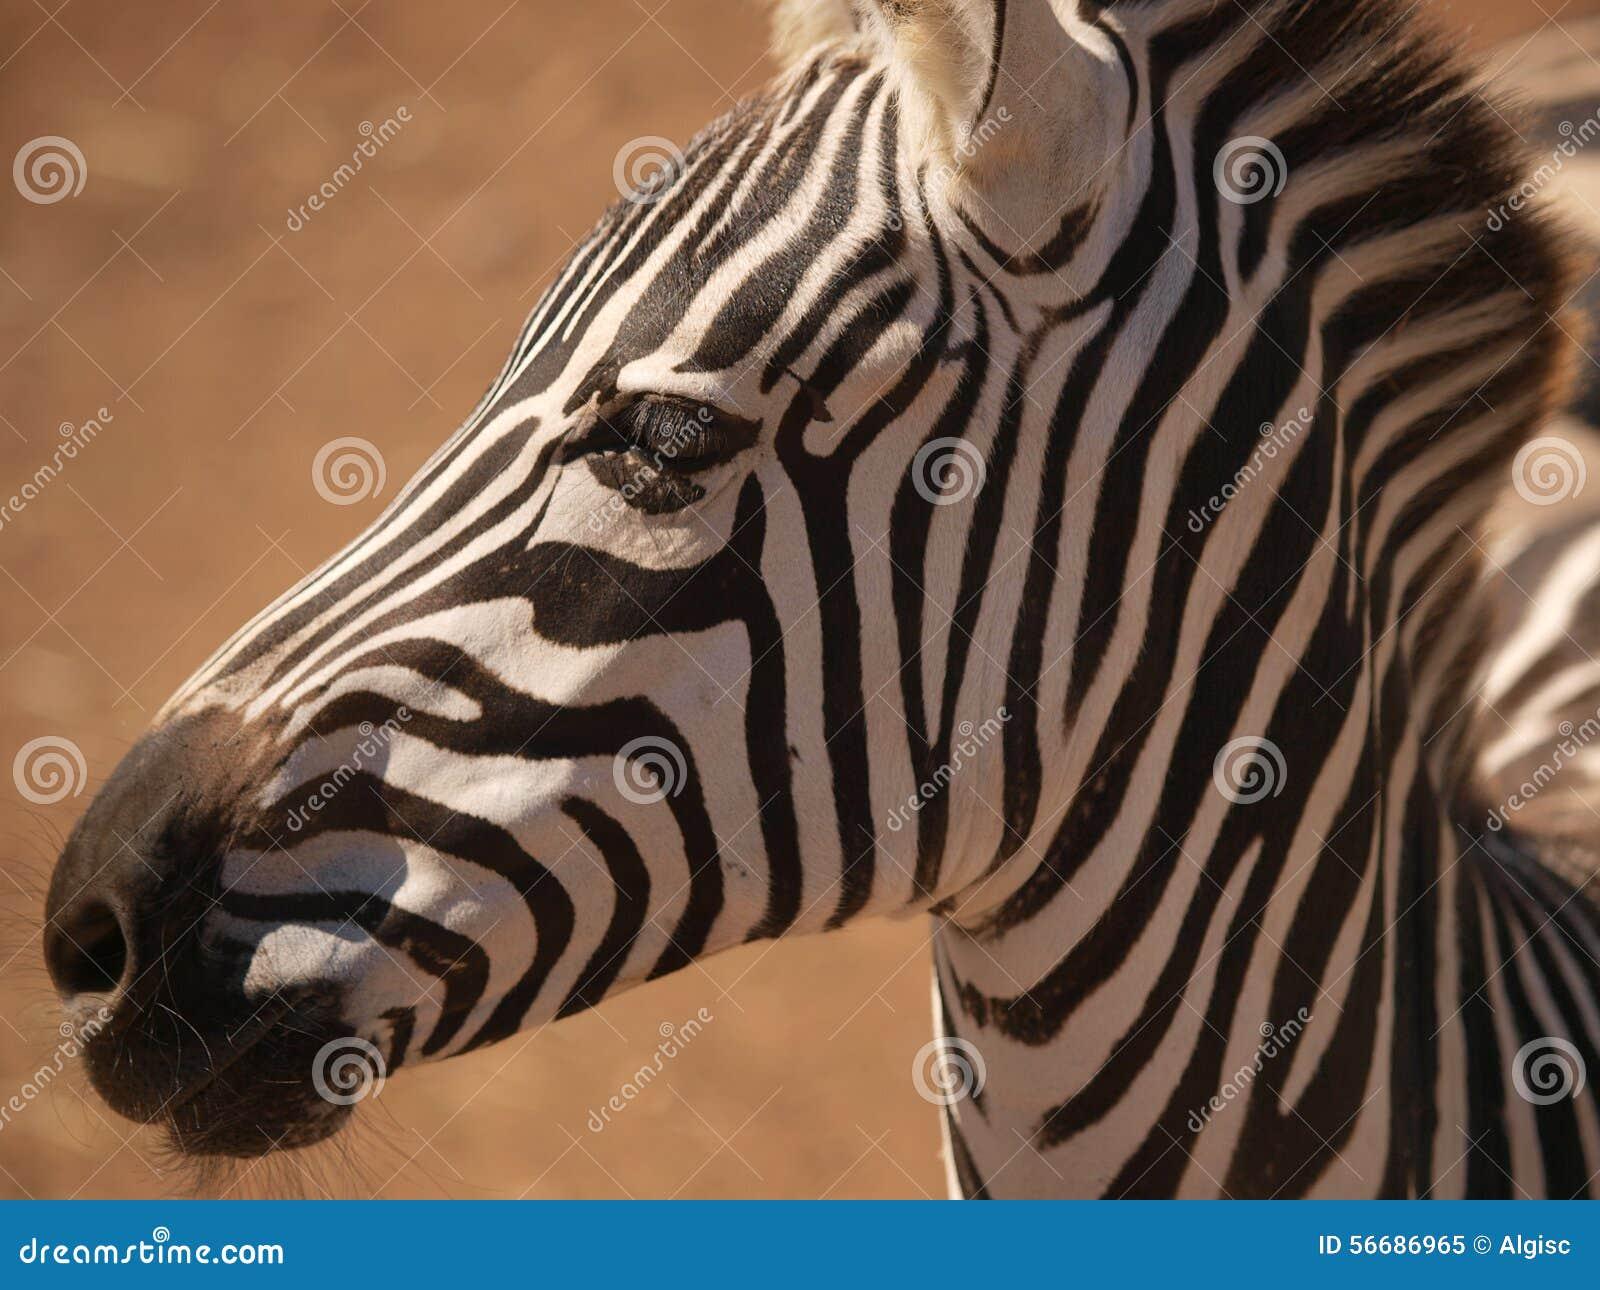 zebra close look stock photo image 56686965. Black Bedroom Furniture Sets. Home Design Ideas